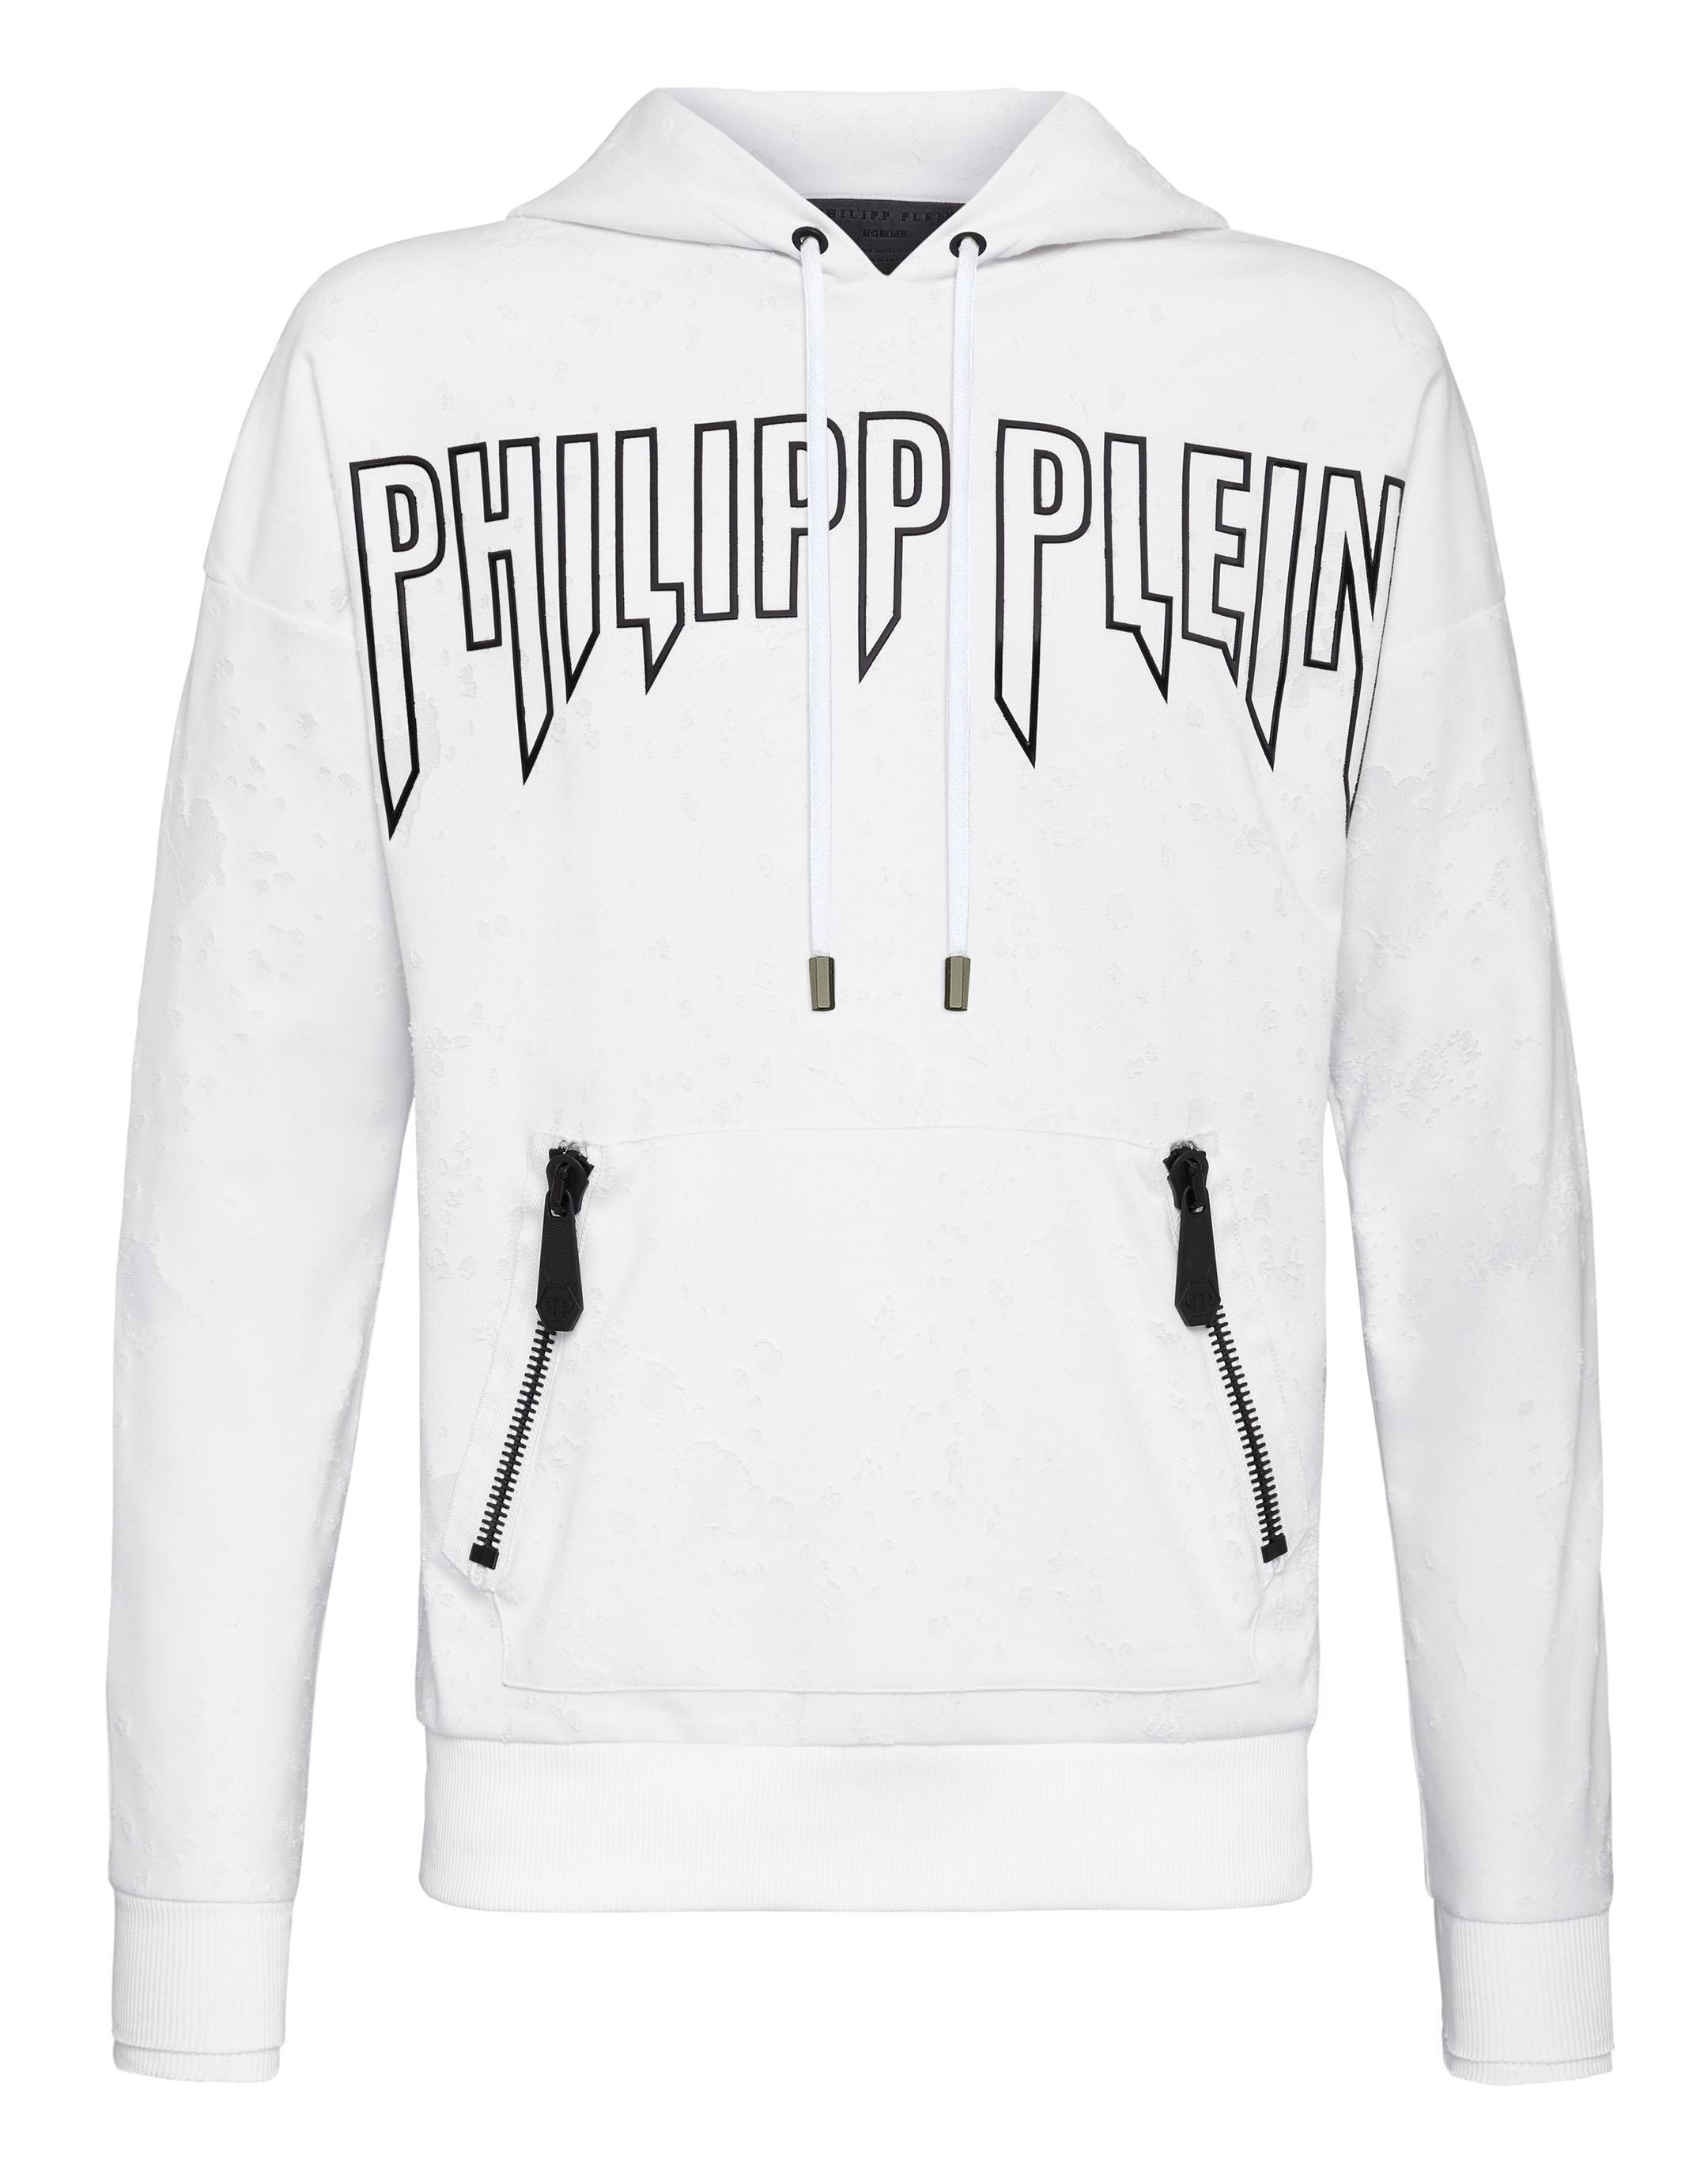 Hoodie Sweatshirt Rock Pp Philipp Plein Blazer Korea Kode Bk 01